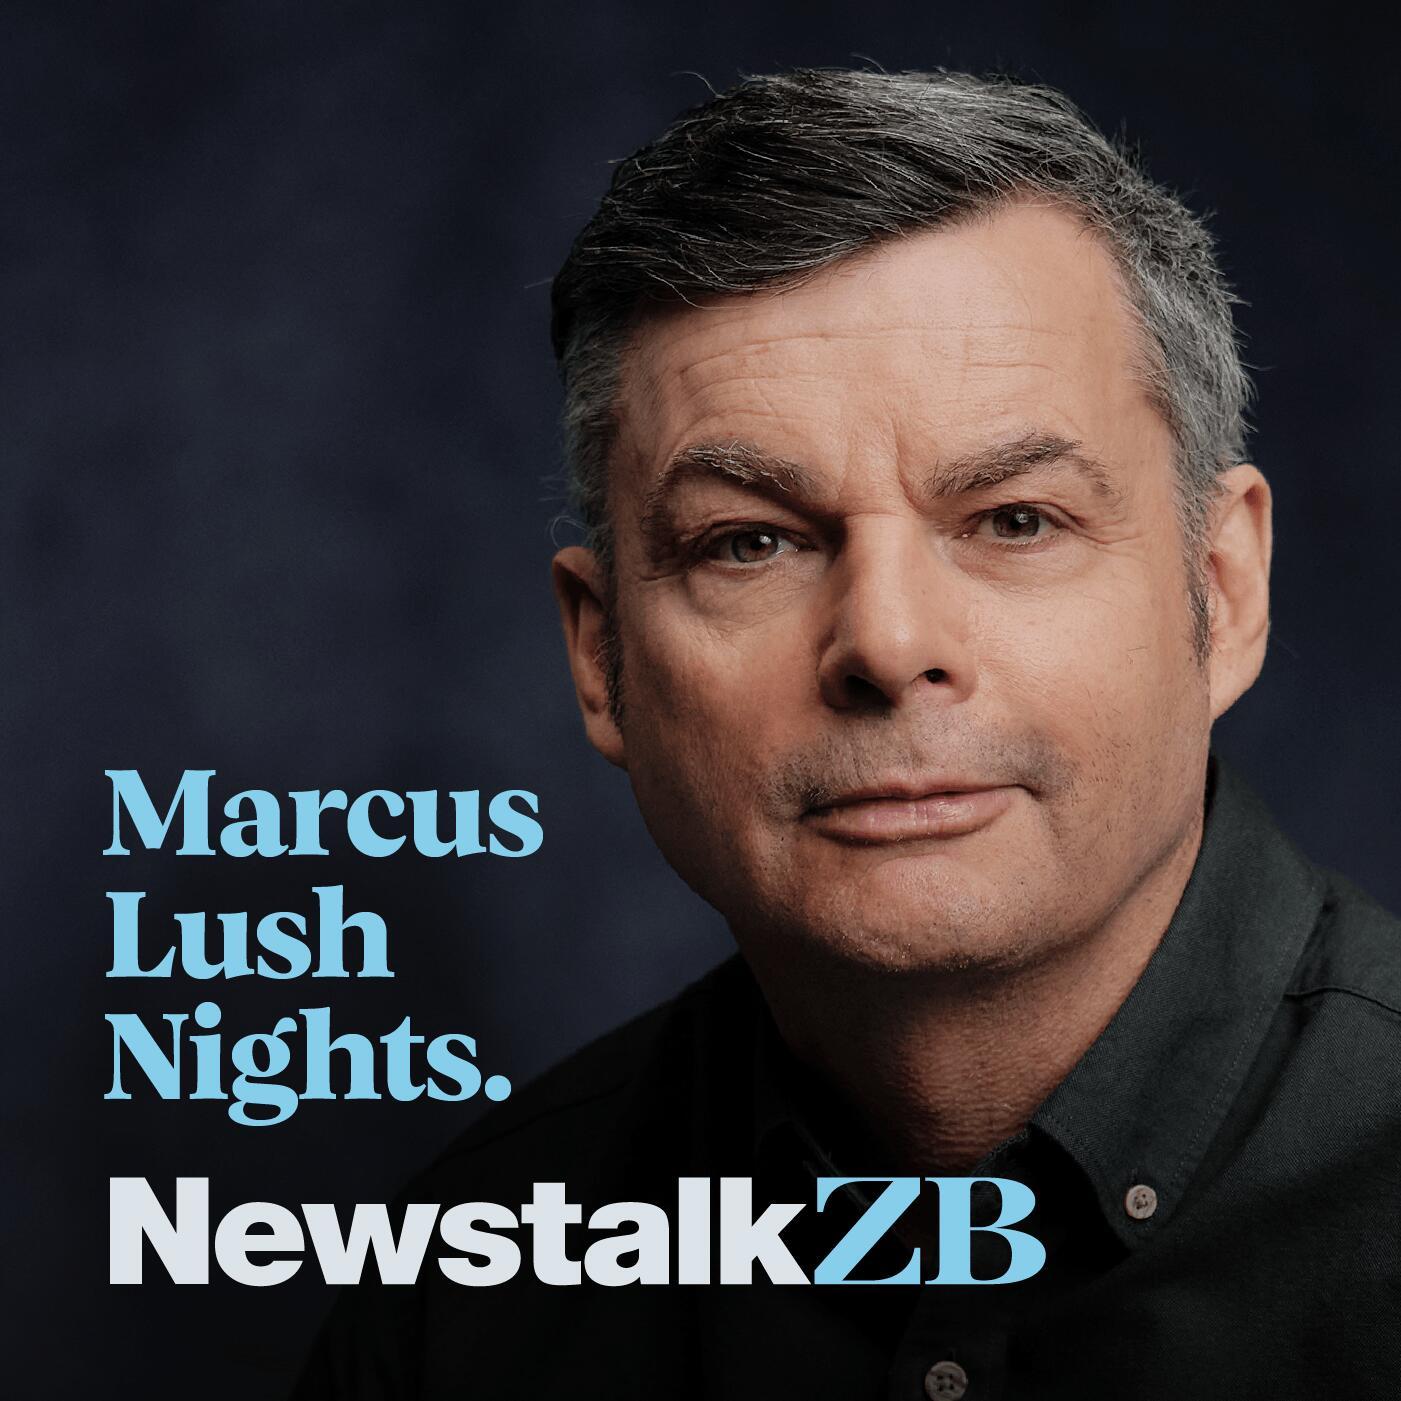 Marcus Lush Nights